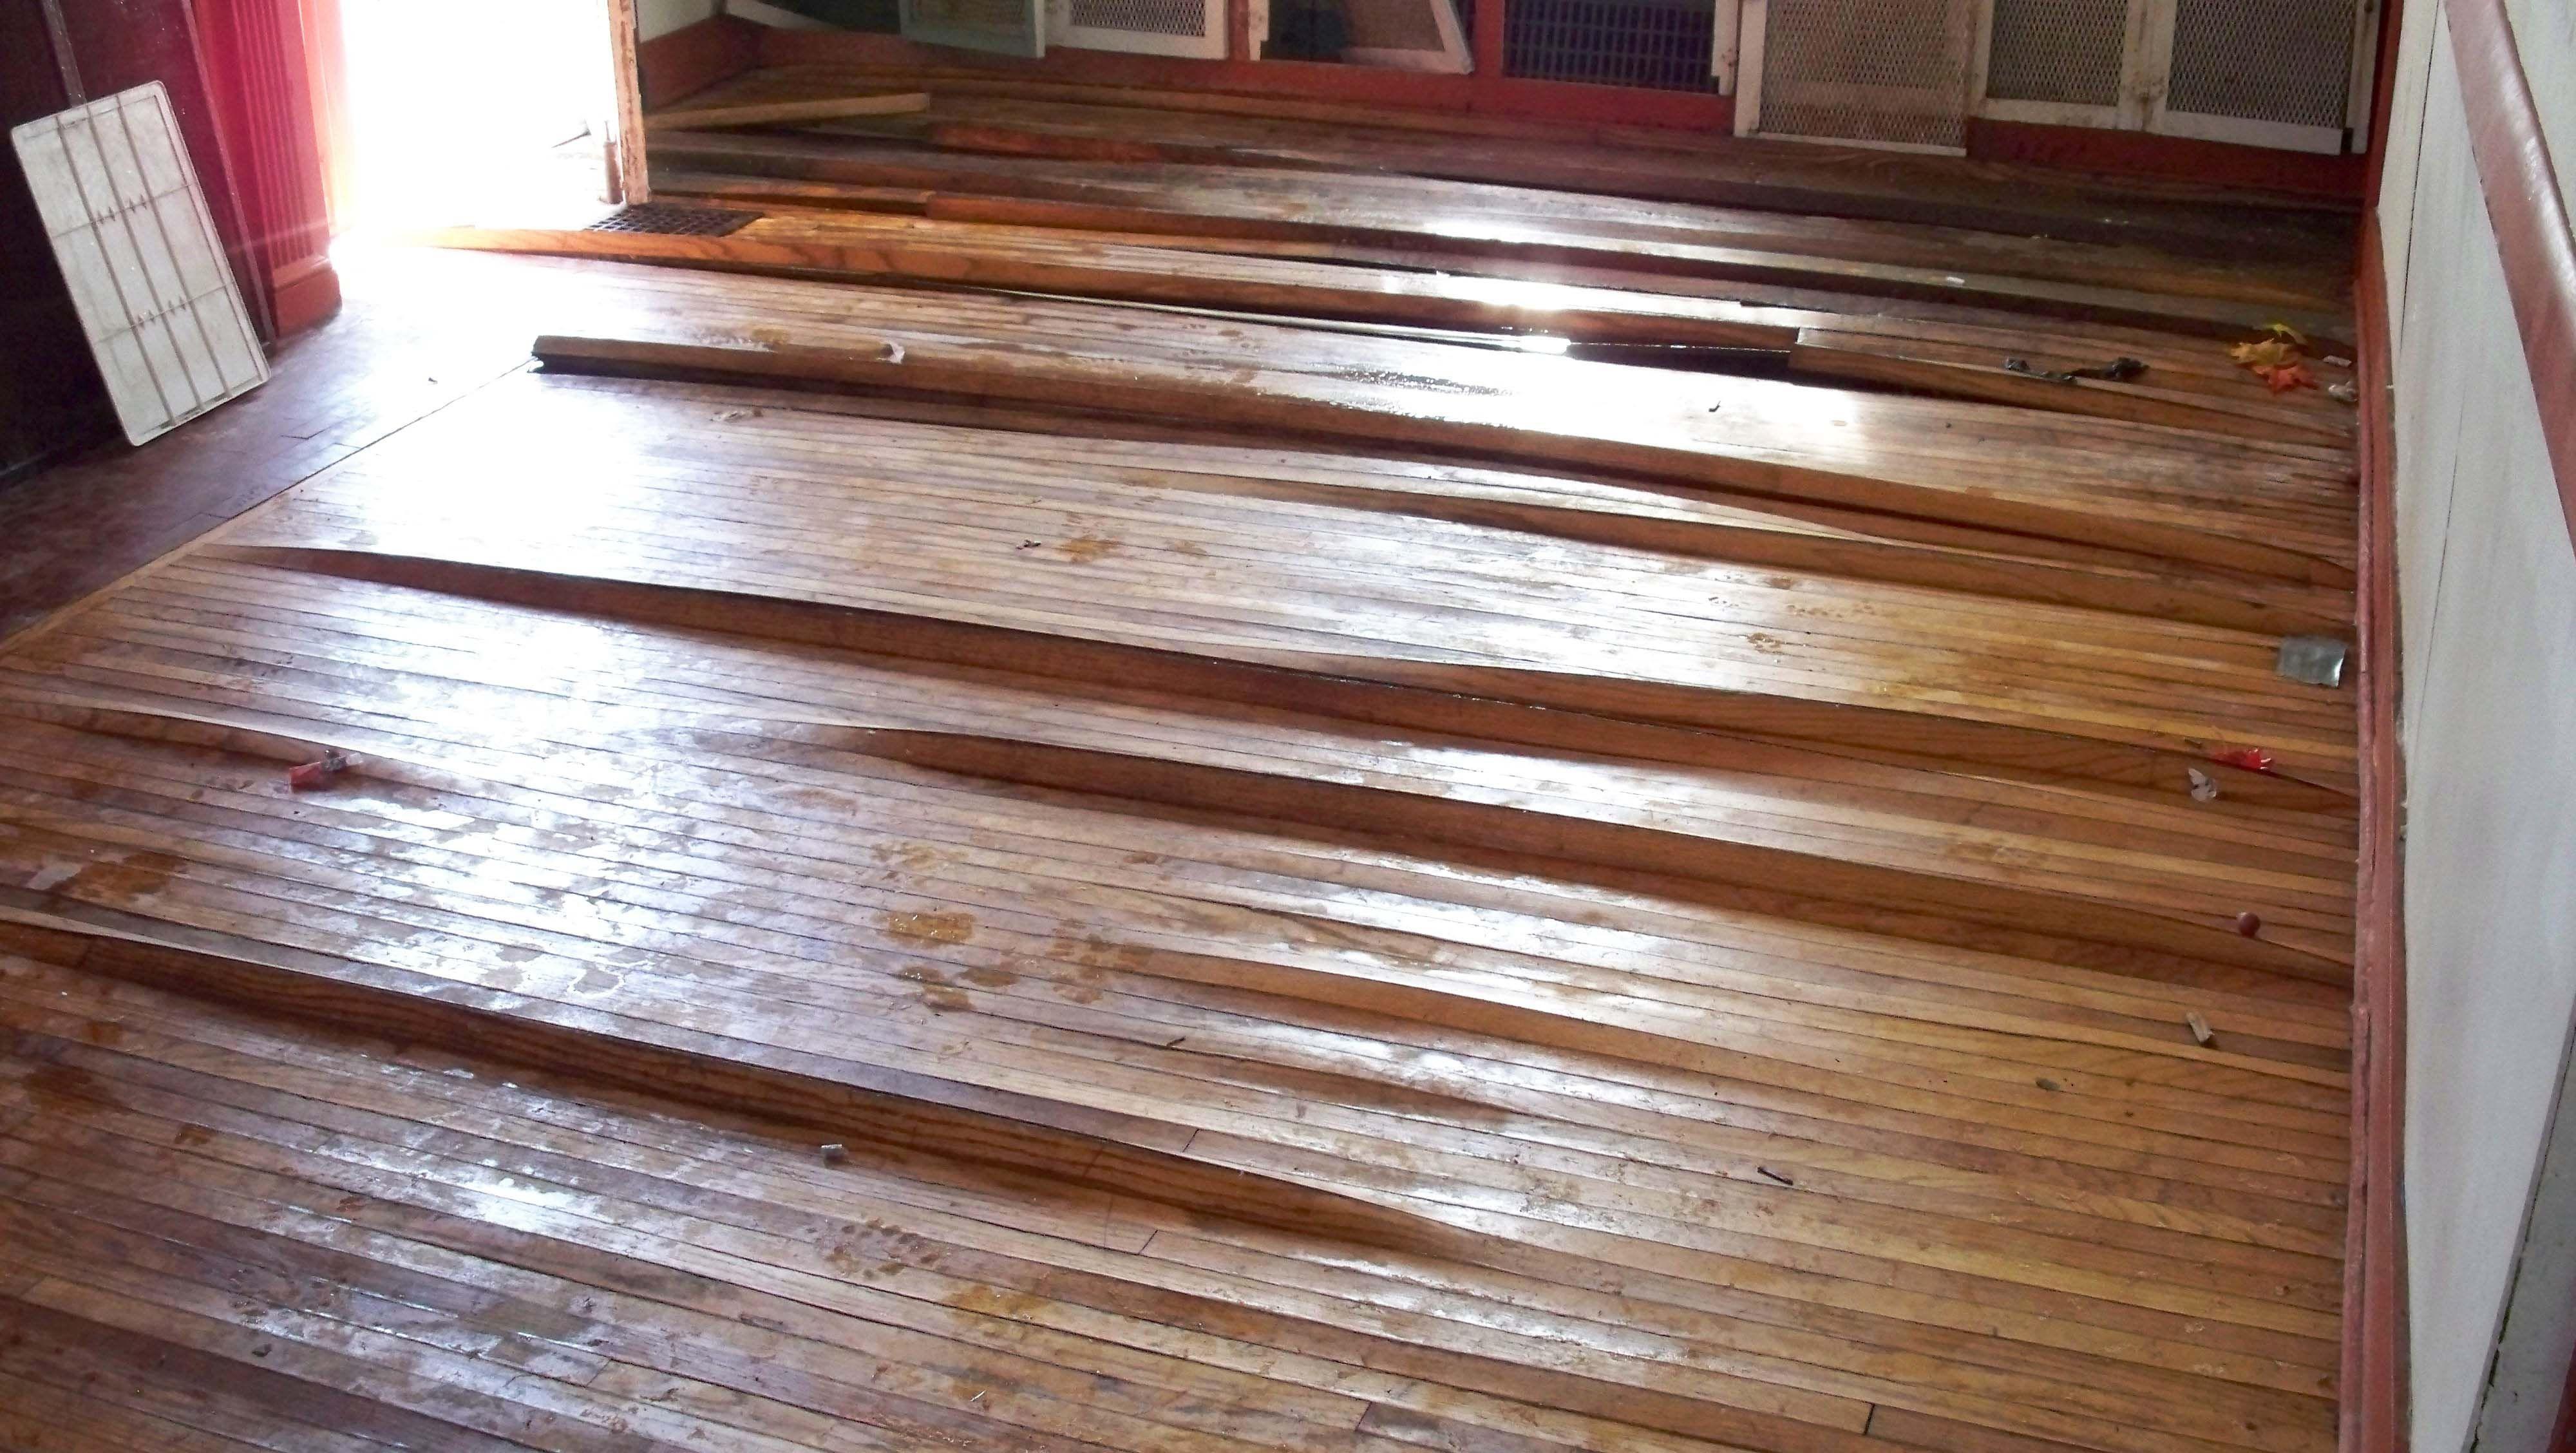 how to lay hardwood flooring on plywood of hardwood floor water damage warping hardwood floors pinterest pertaining to hardwood floor water damage warping